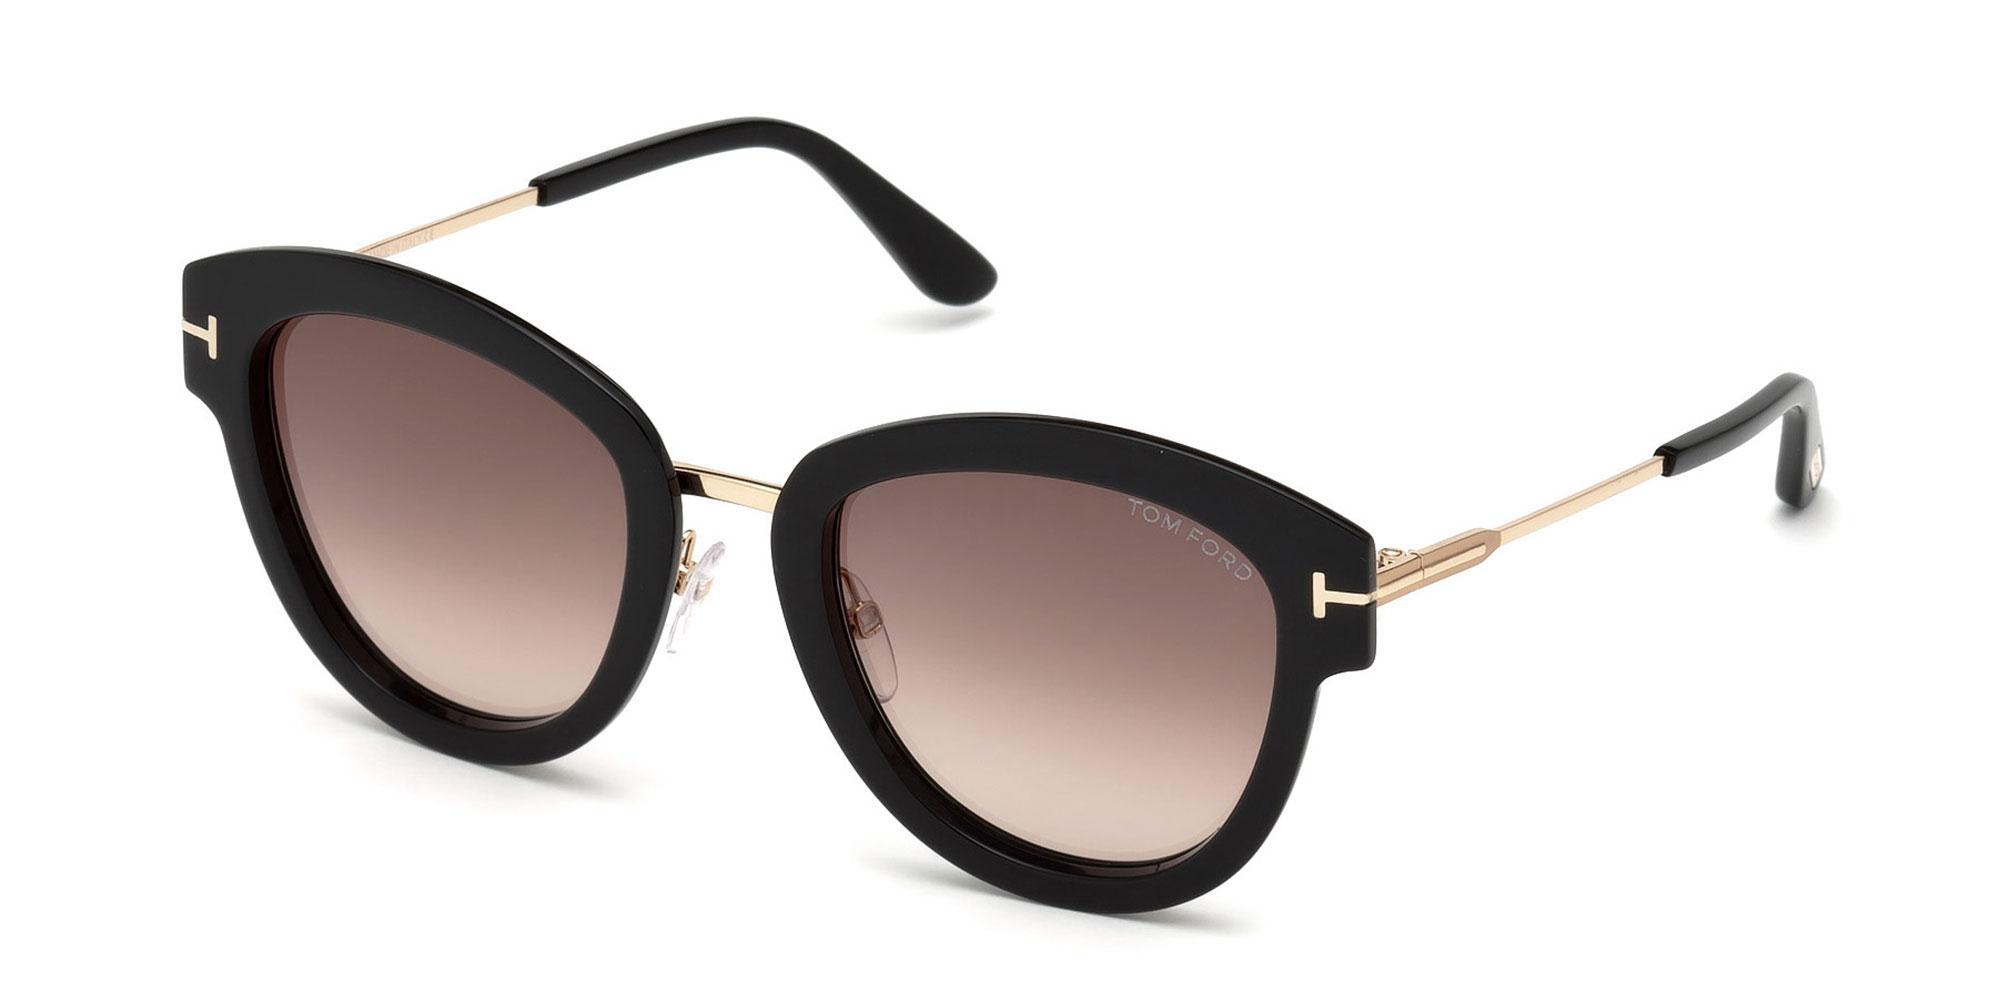 01T FT0574 Sunglasses, Tom Ford